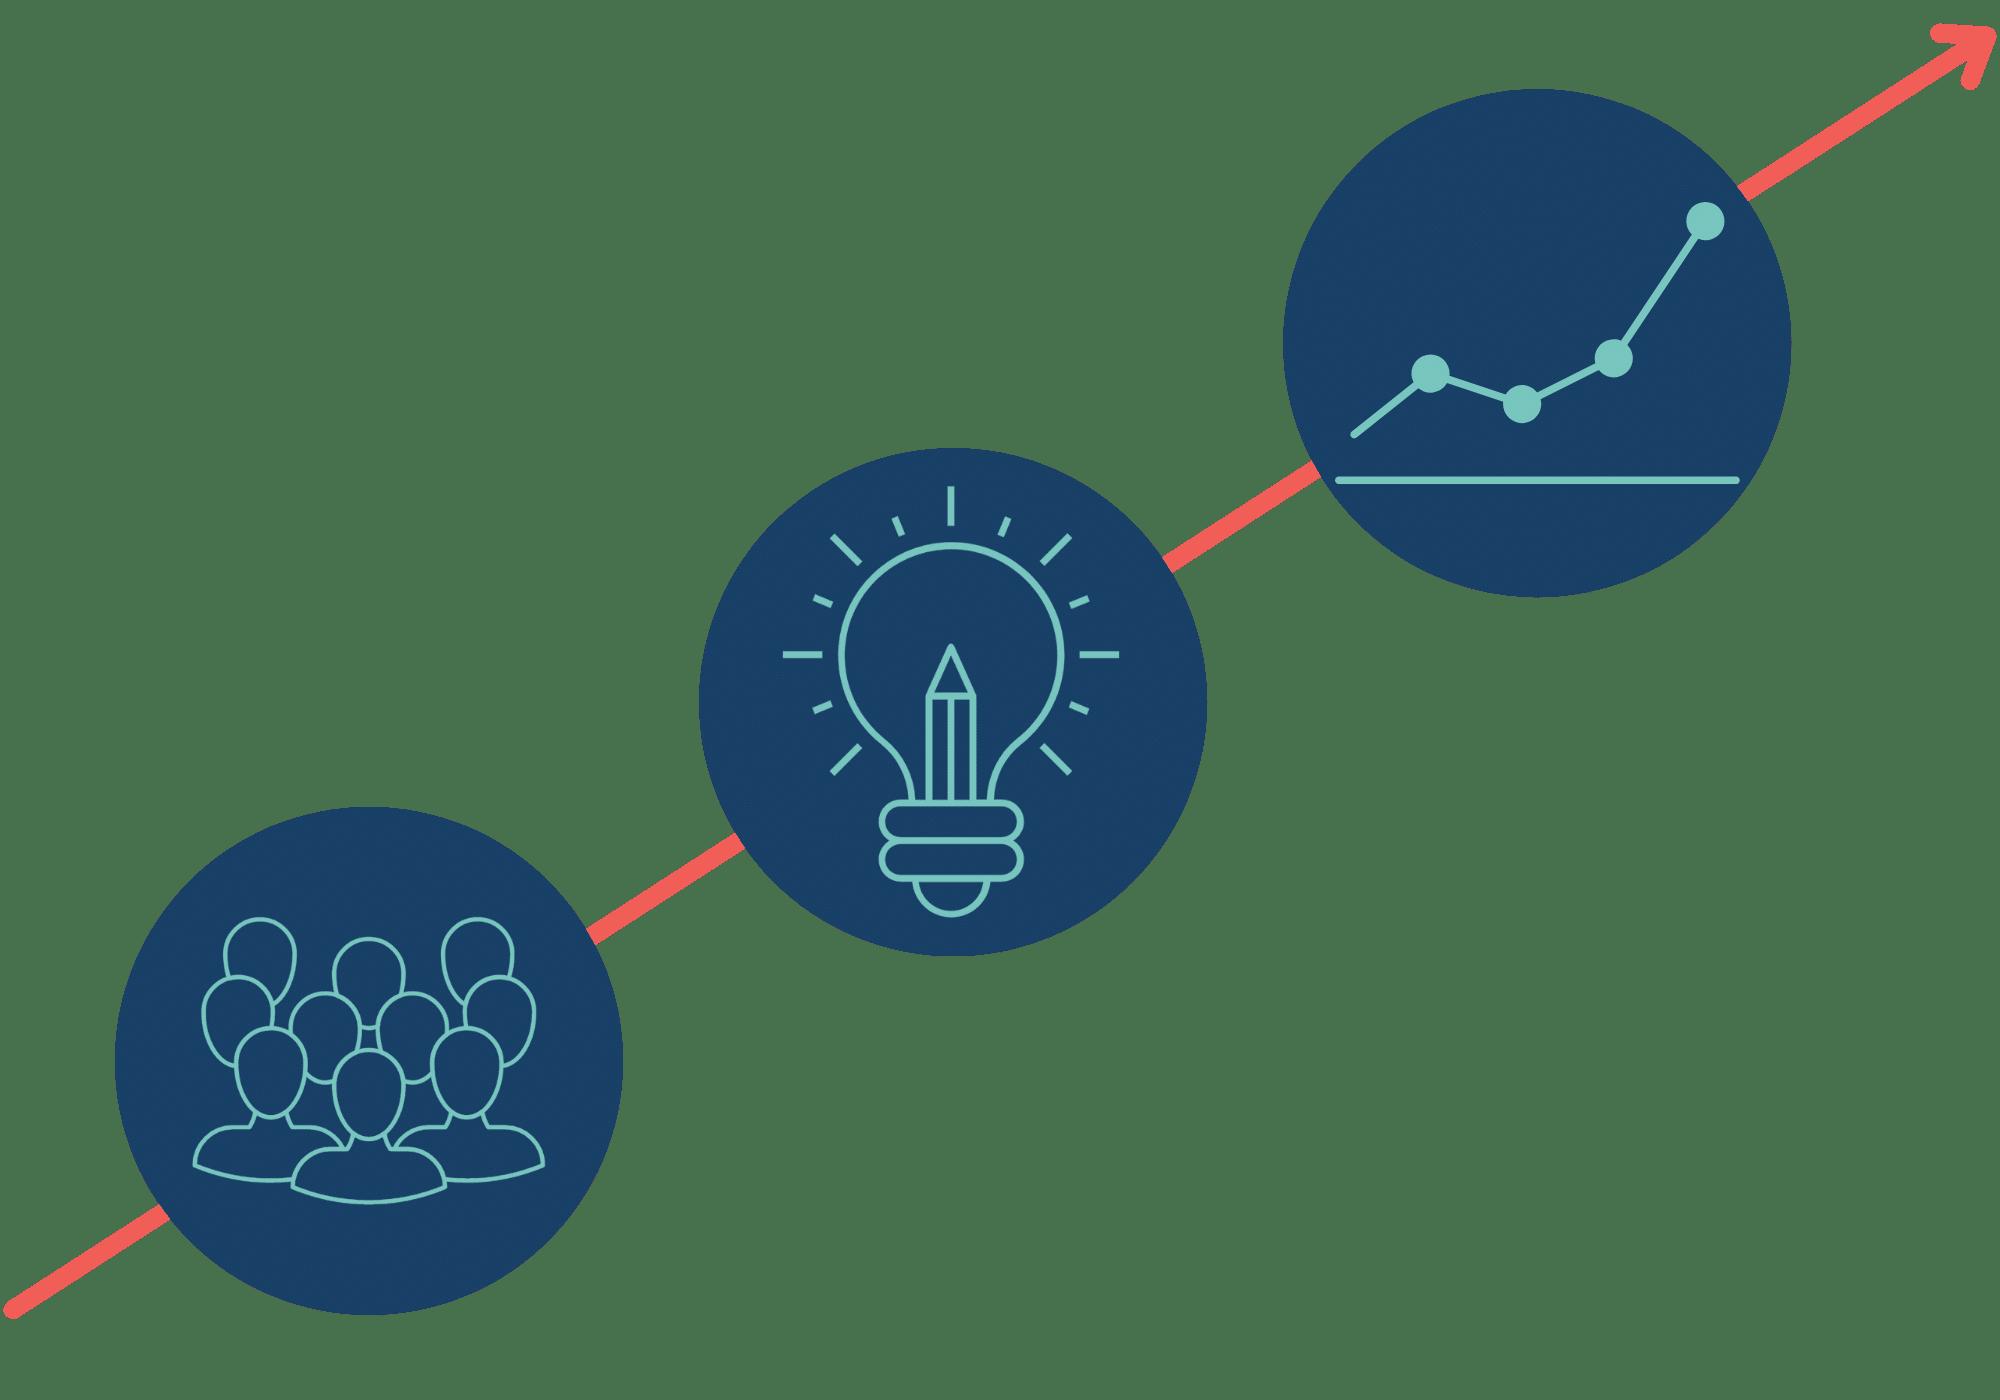 Persona-ontwikkeling - Content van hoger niveau - Productpagina